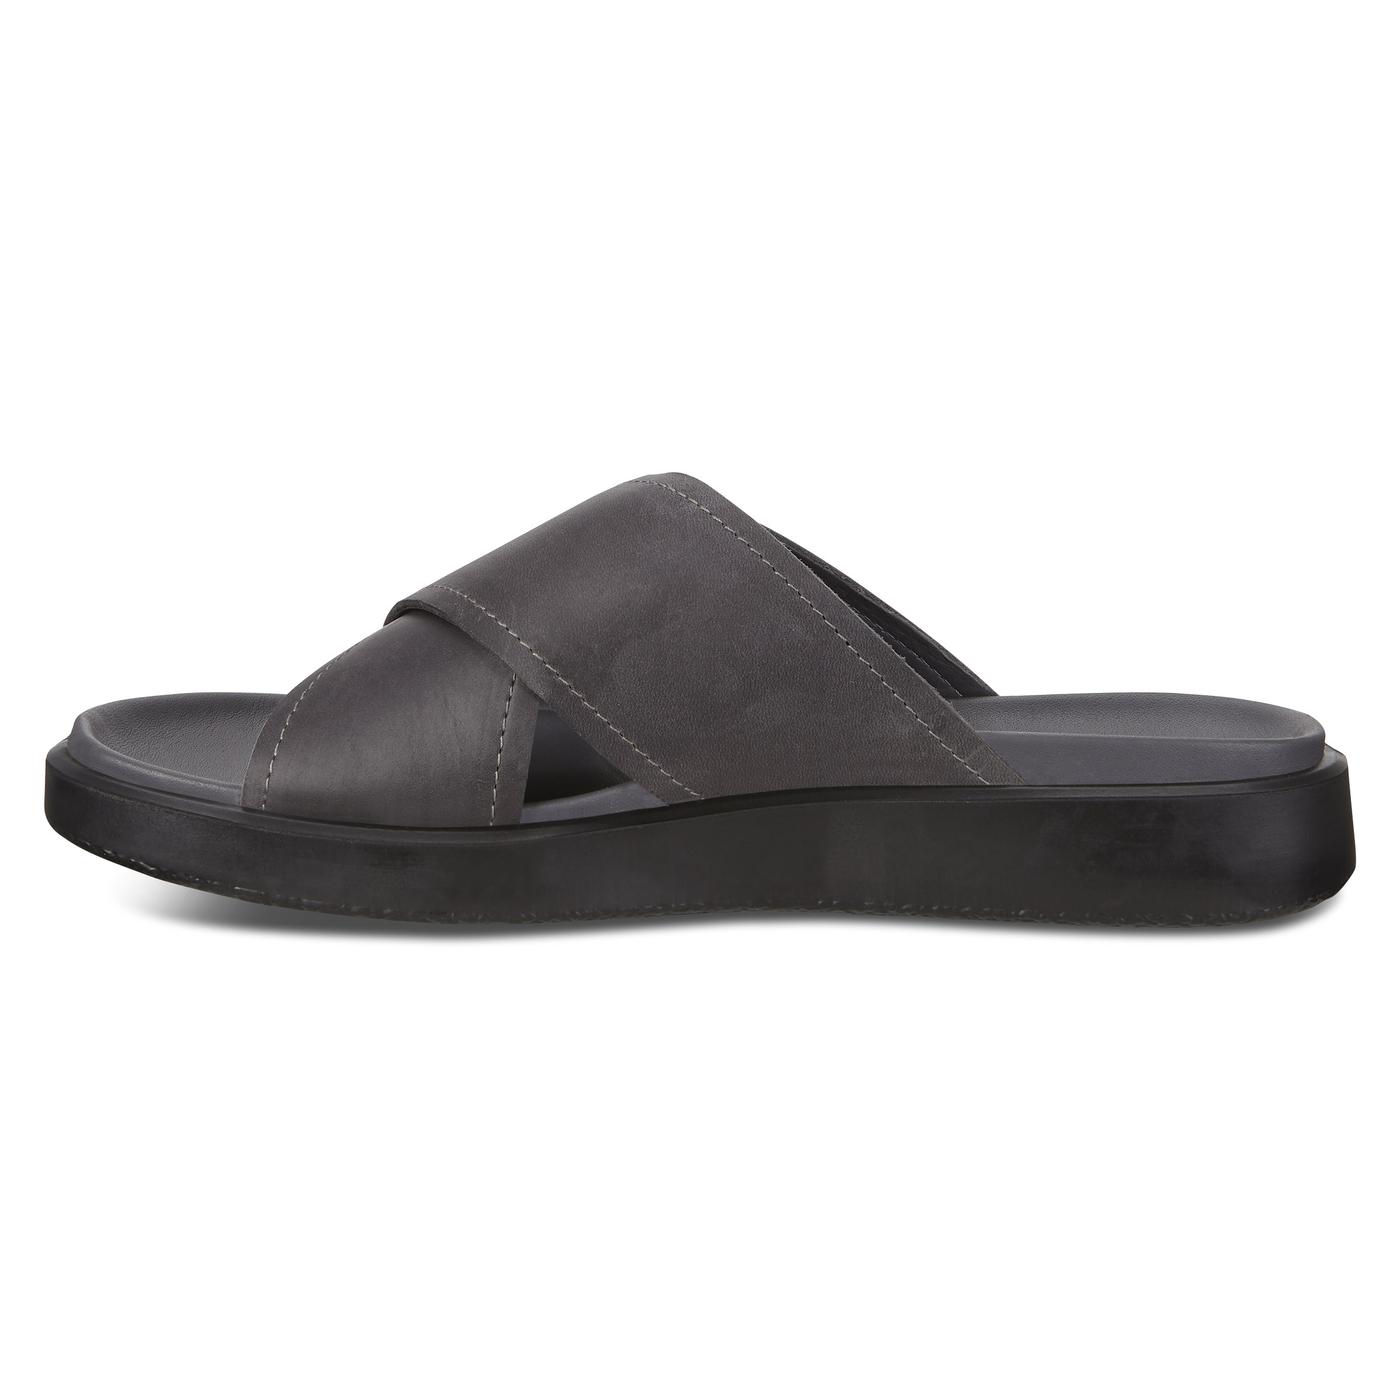 ECCO FLOWT LX Men's Sandal